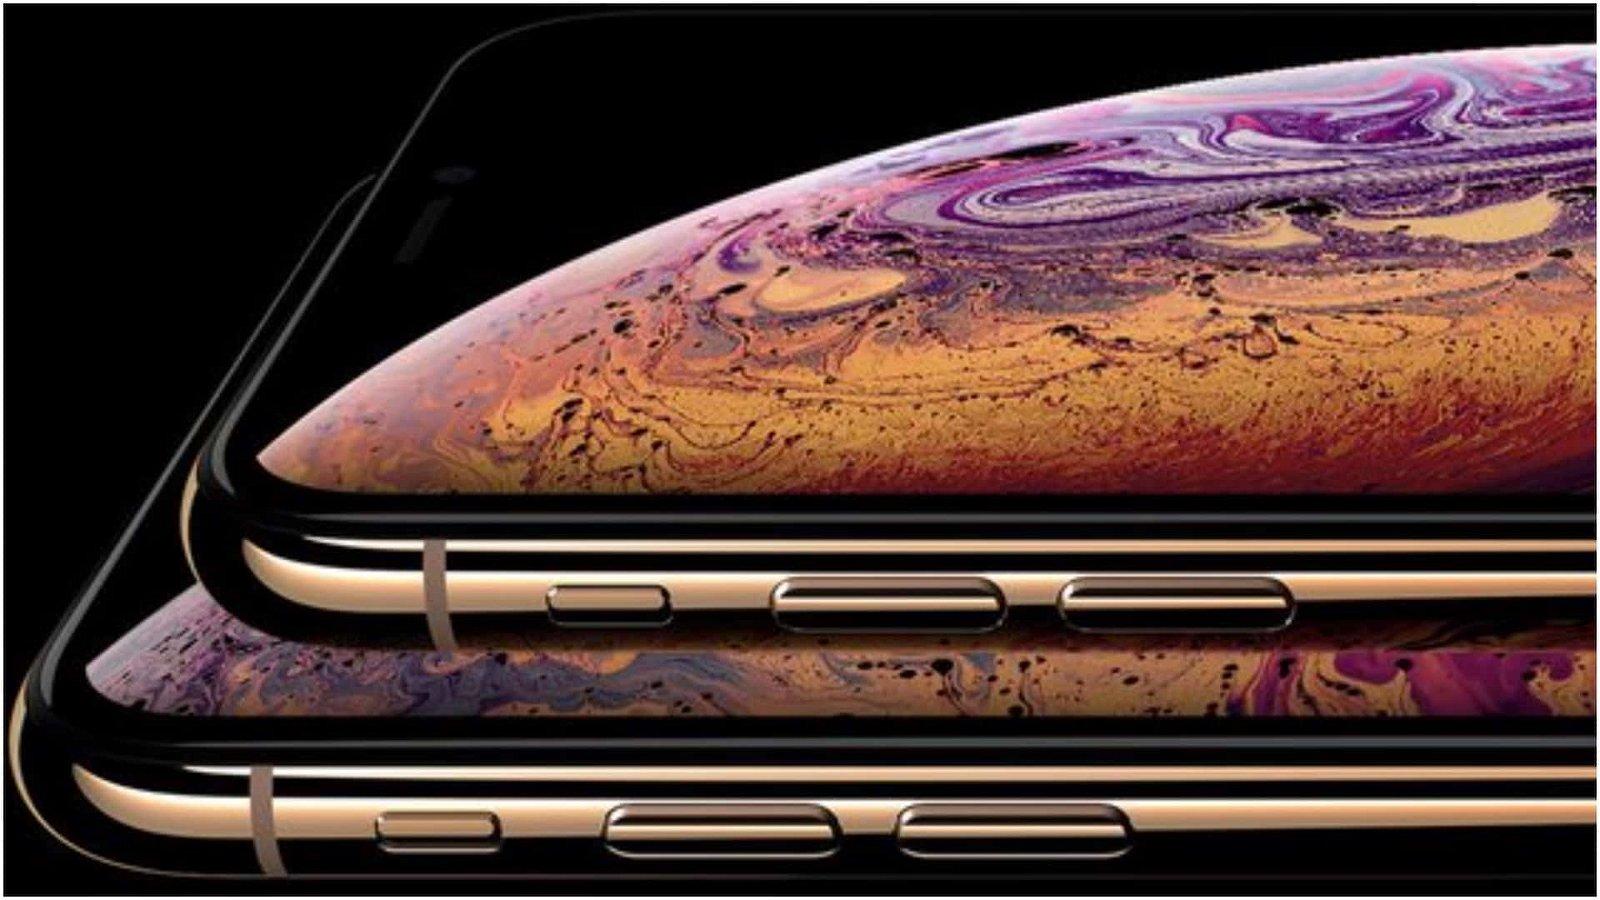 Apple Announces Three New iPhones at 2018 Keynote 1